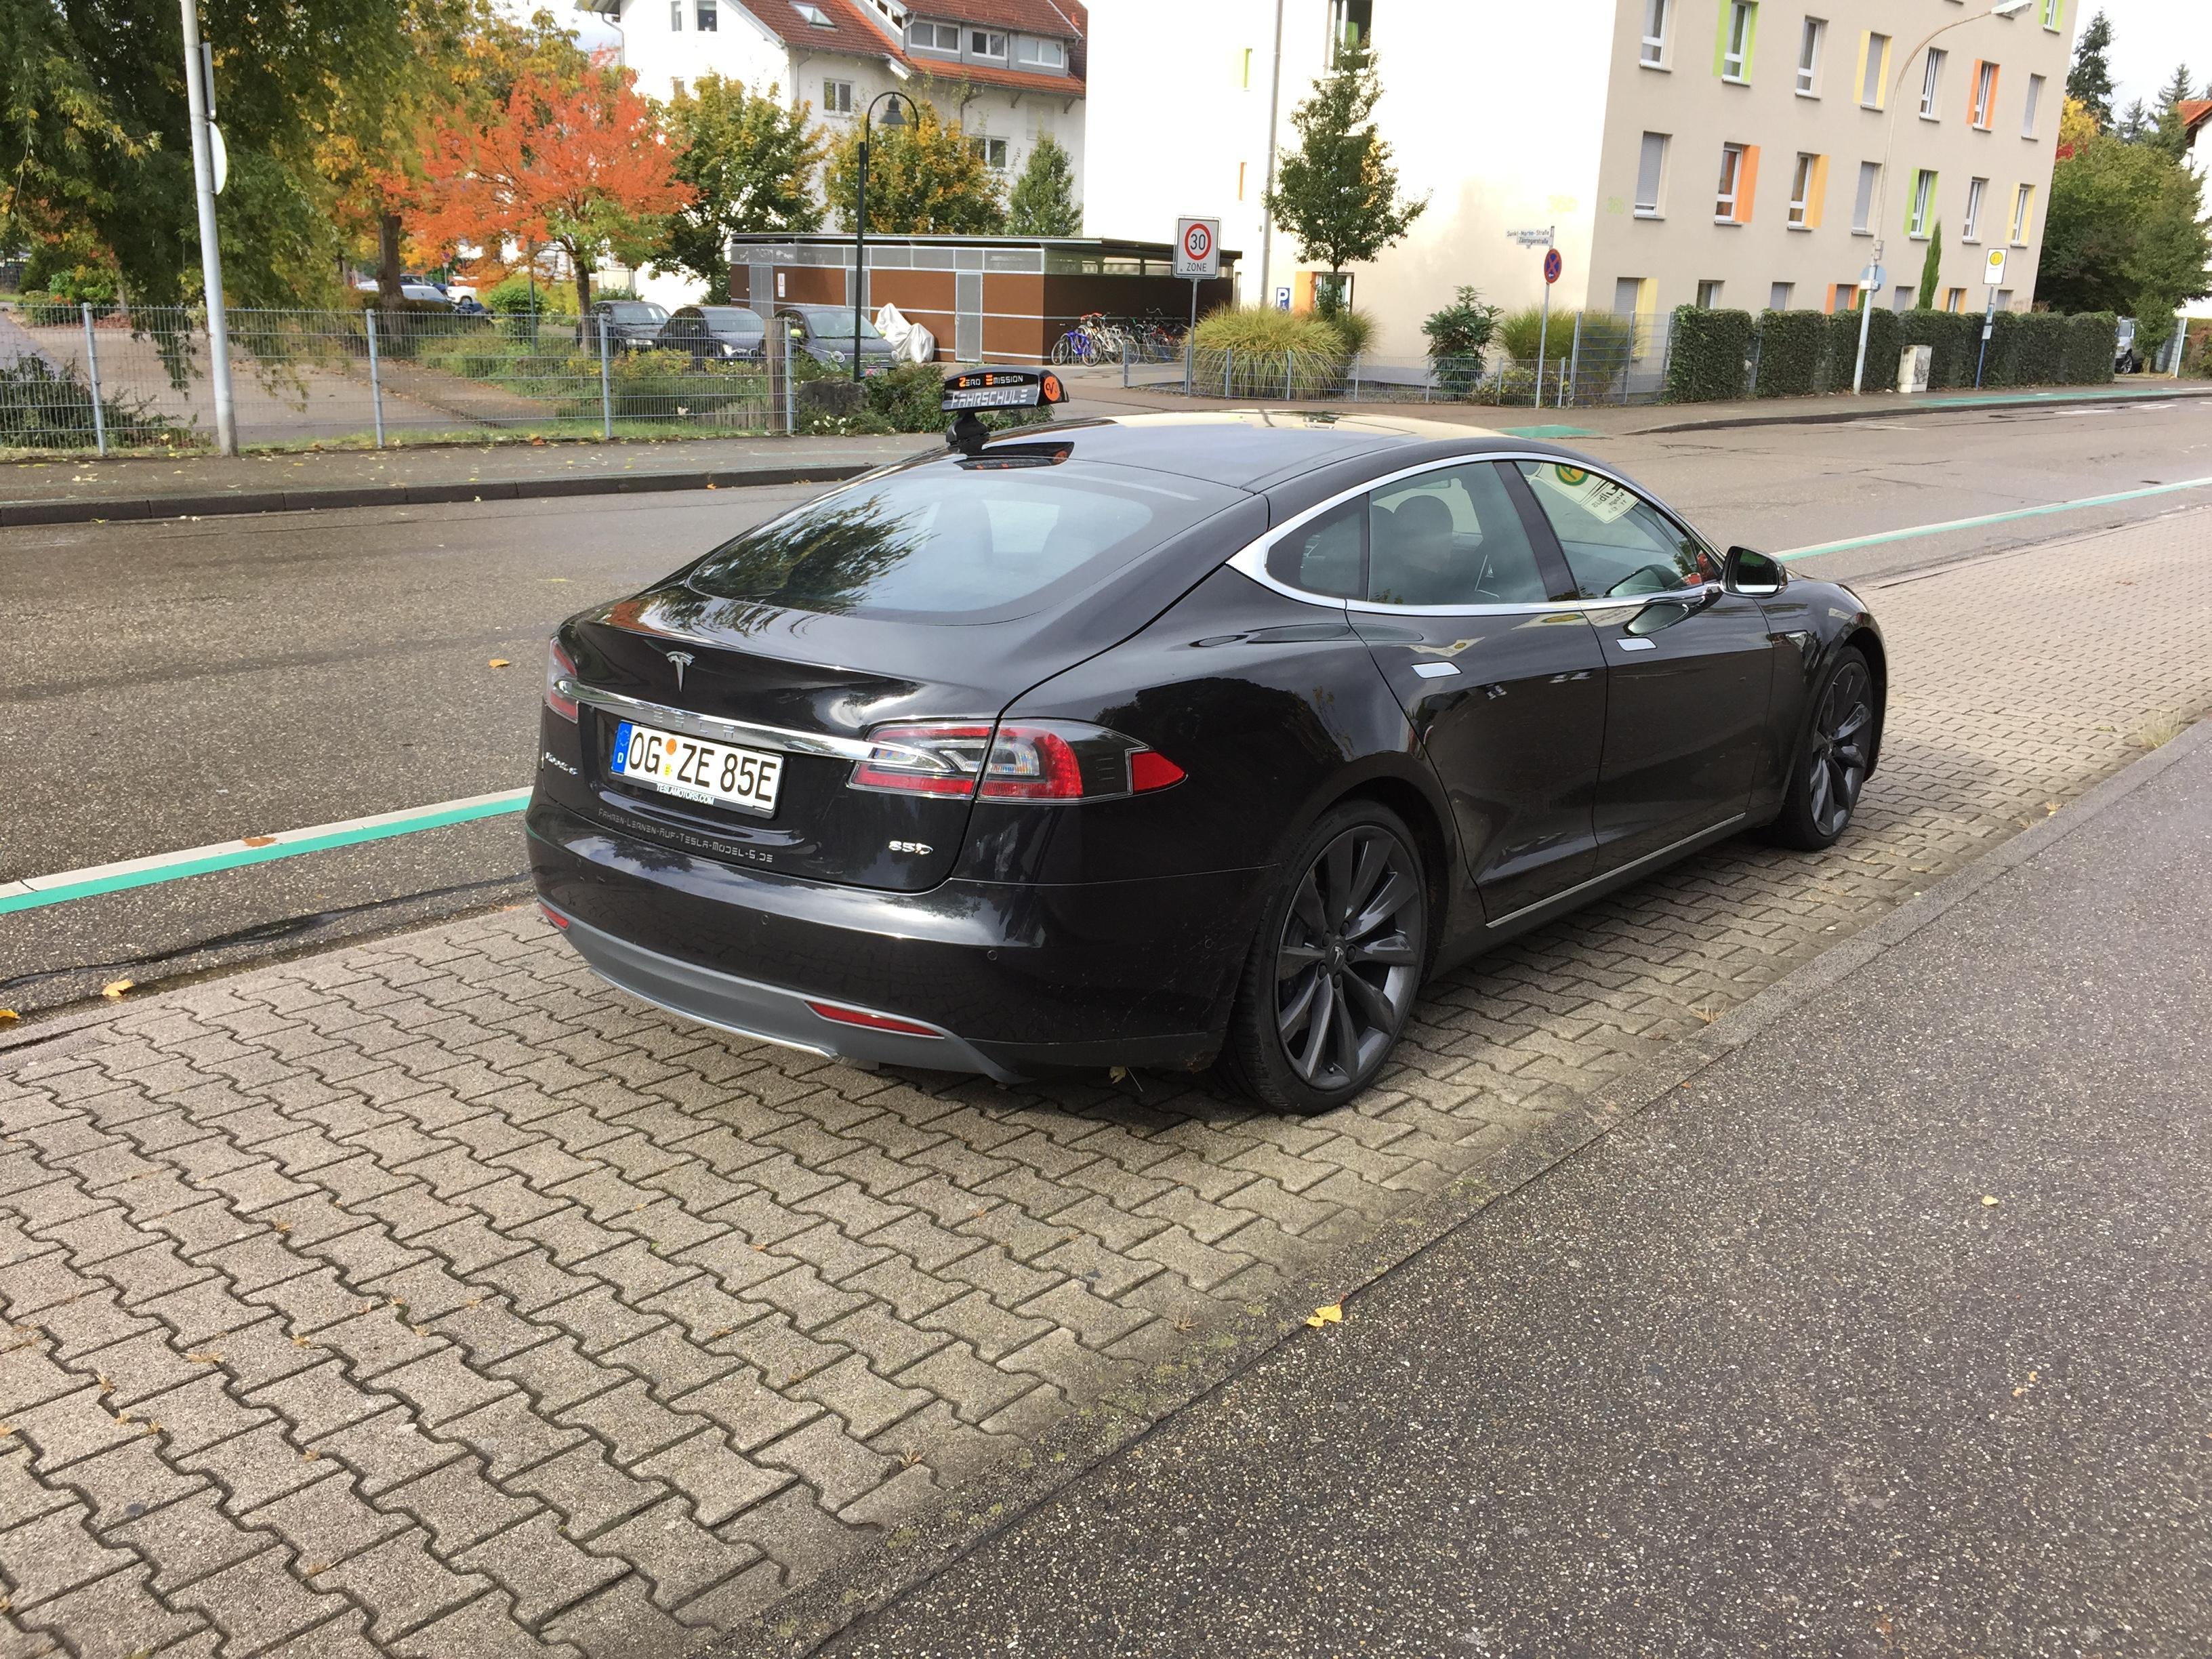 Driving Instructor Accounts Spreadsheet Pertaining To Driving School Tesla! Seen In Germany : Teslamotors